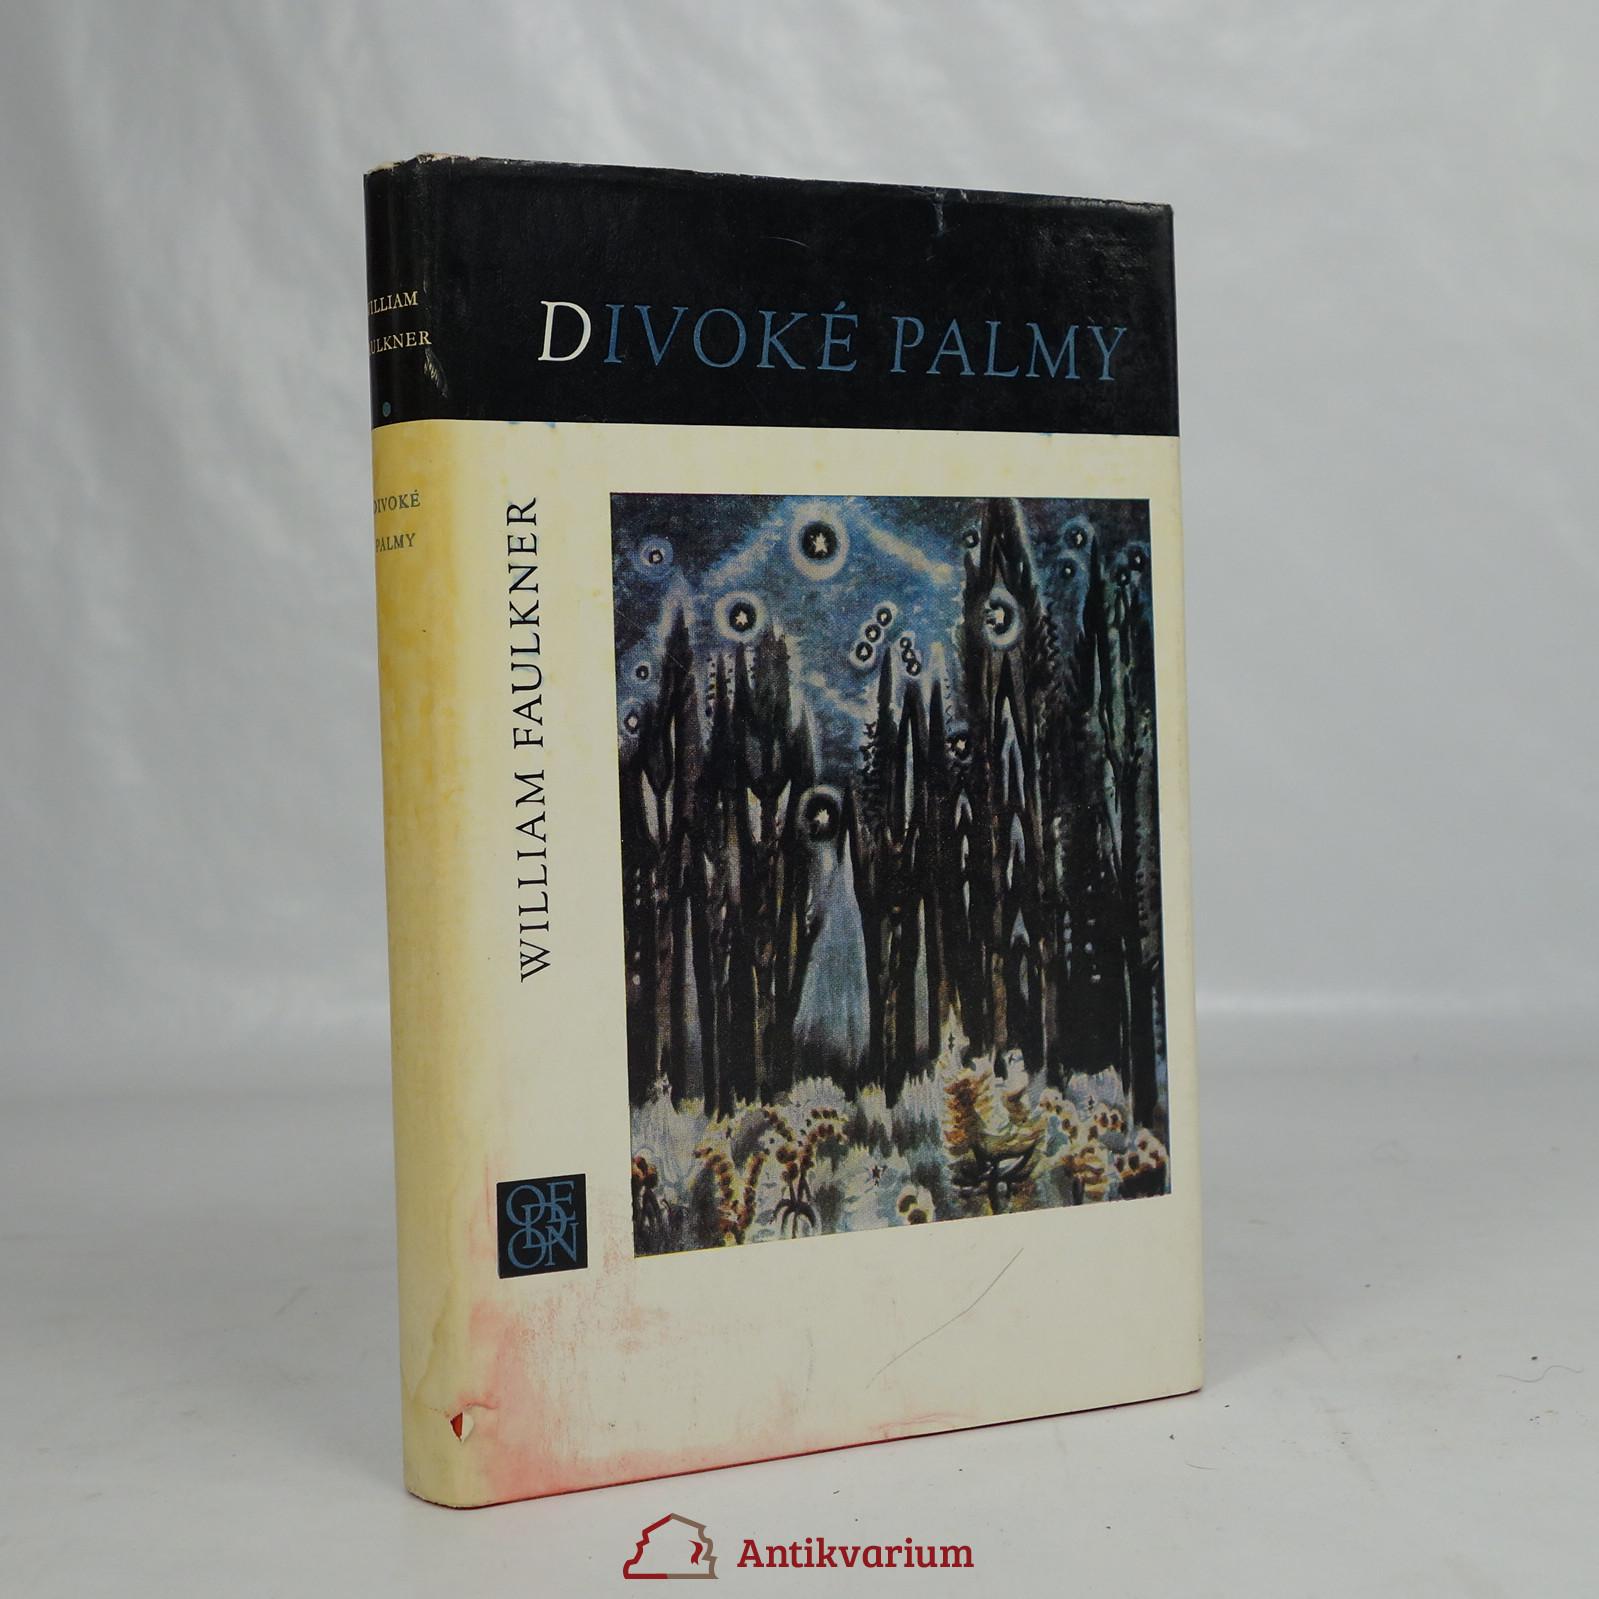 antikvární kniha Divoké palmy, 1978